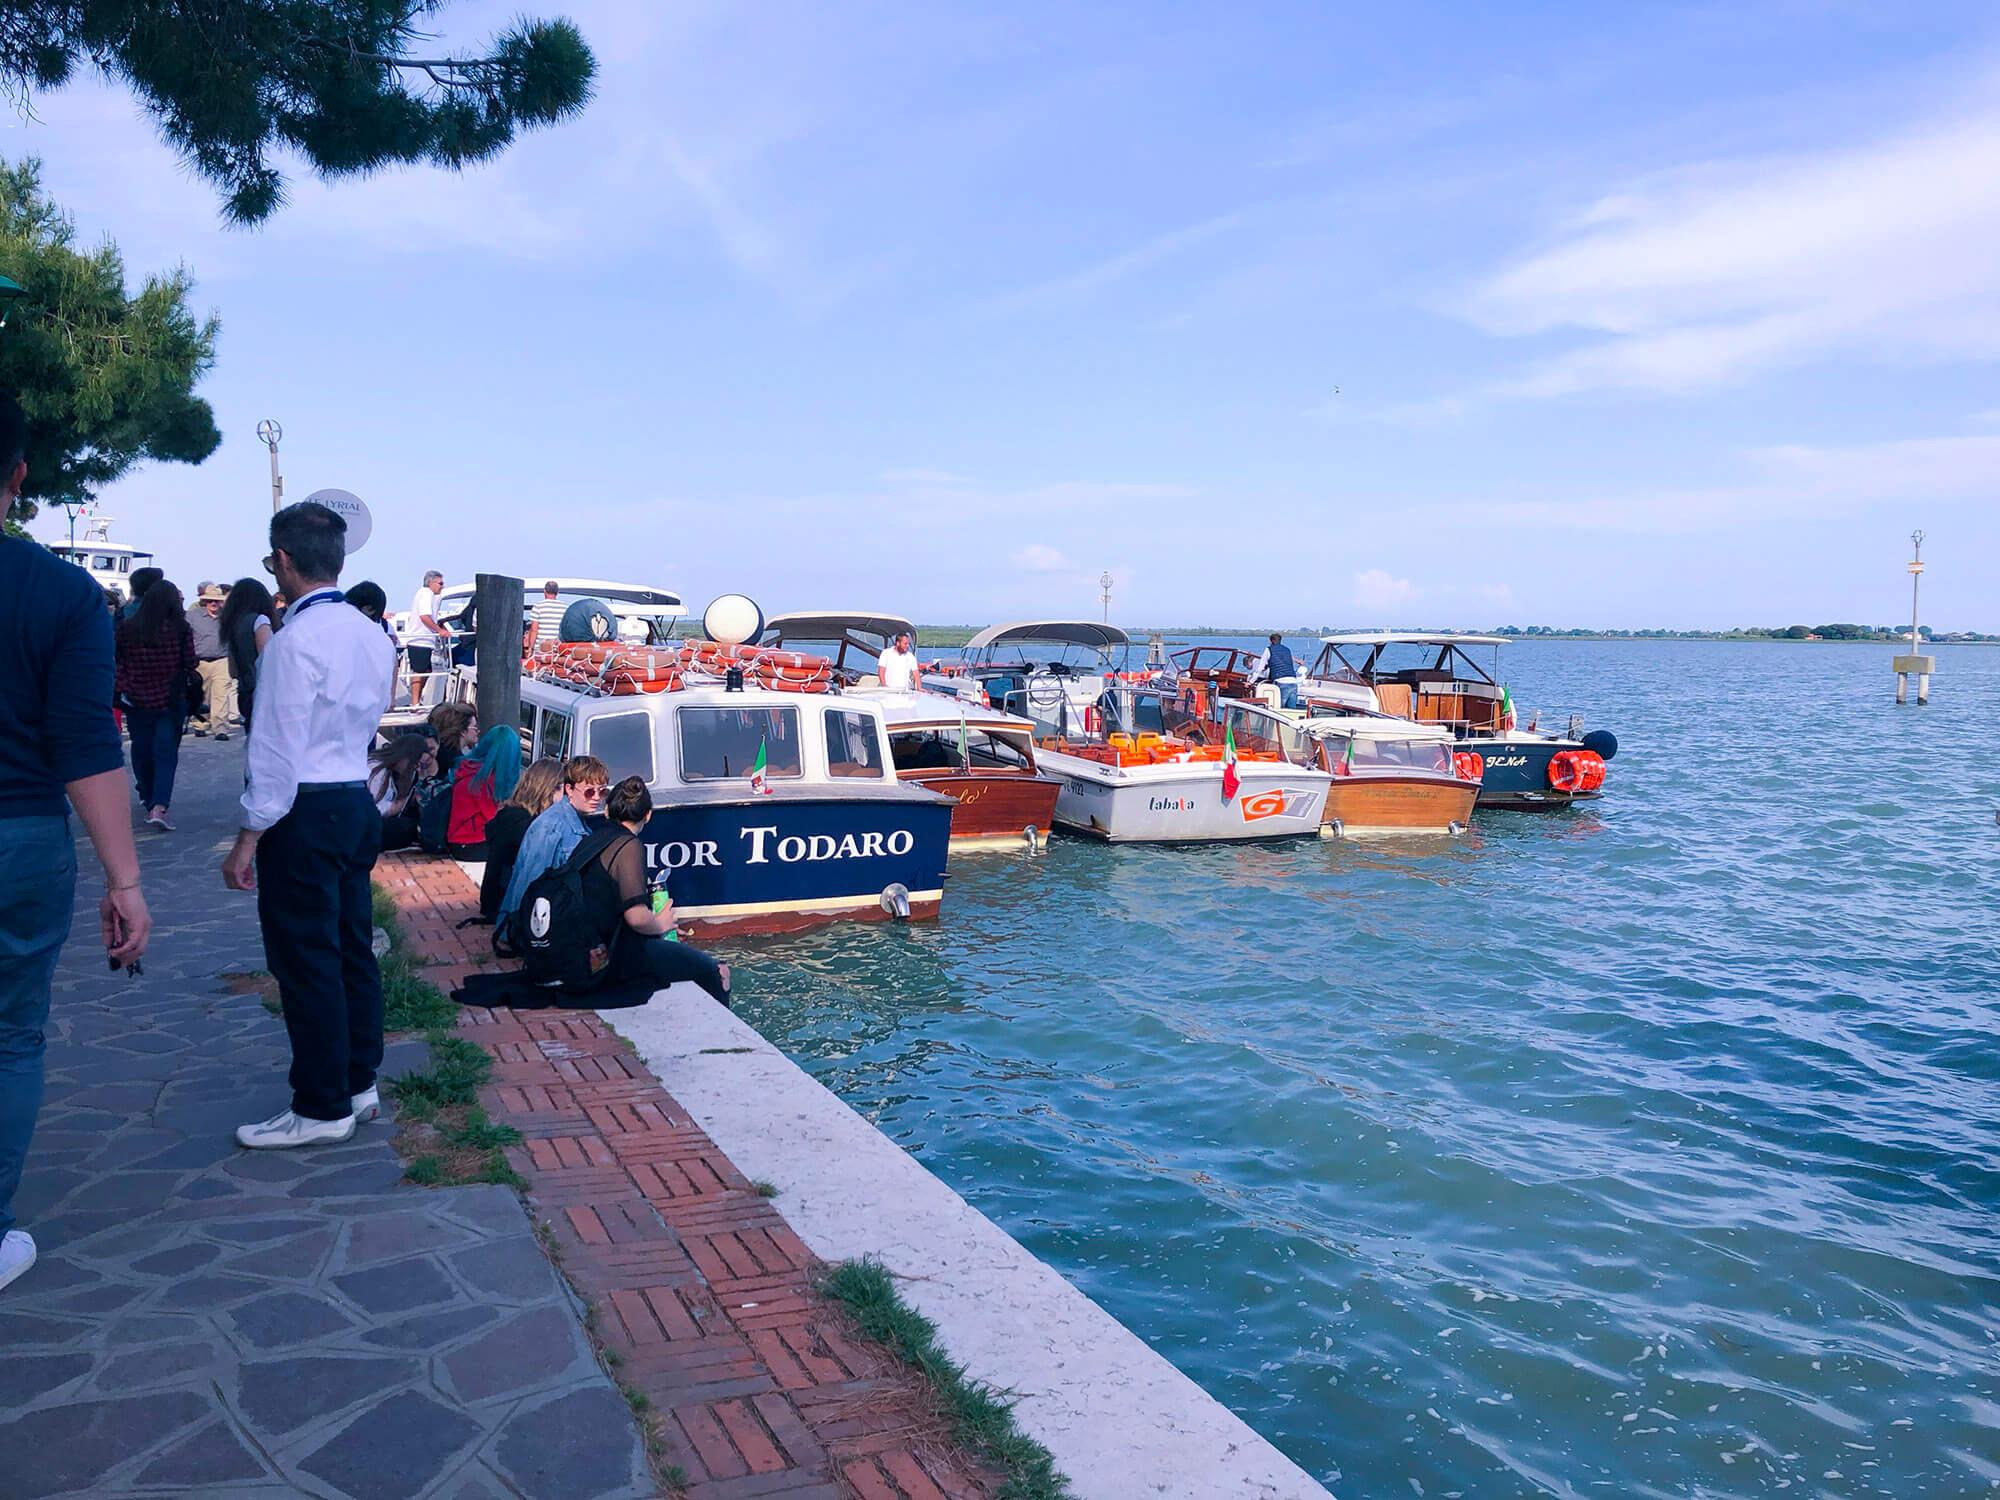 Burano彩色島威尼斯船舶停靠點